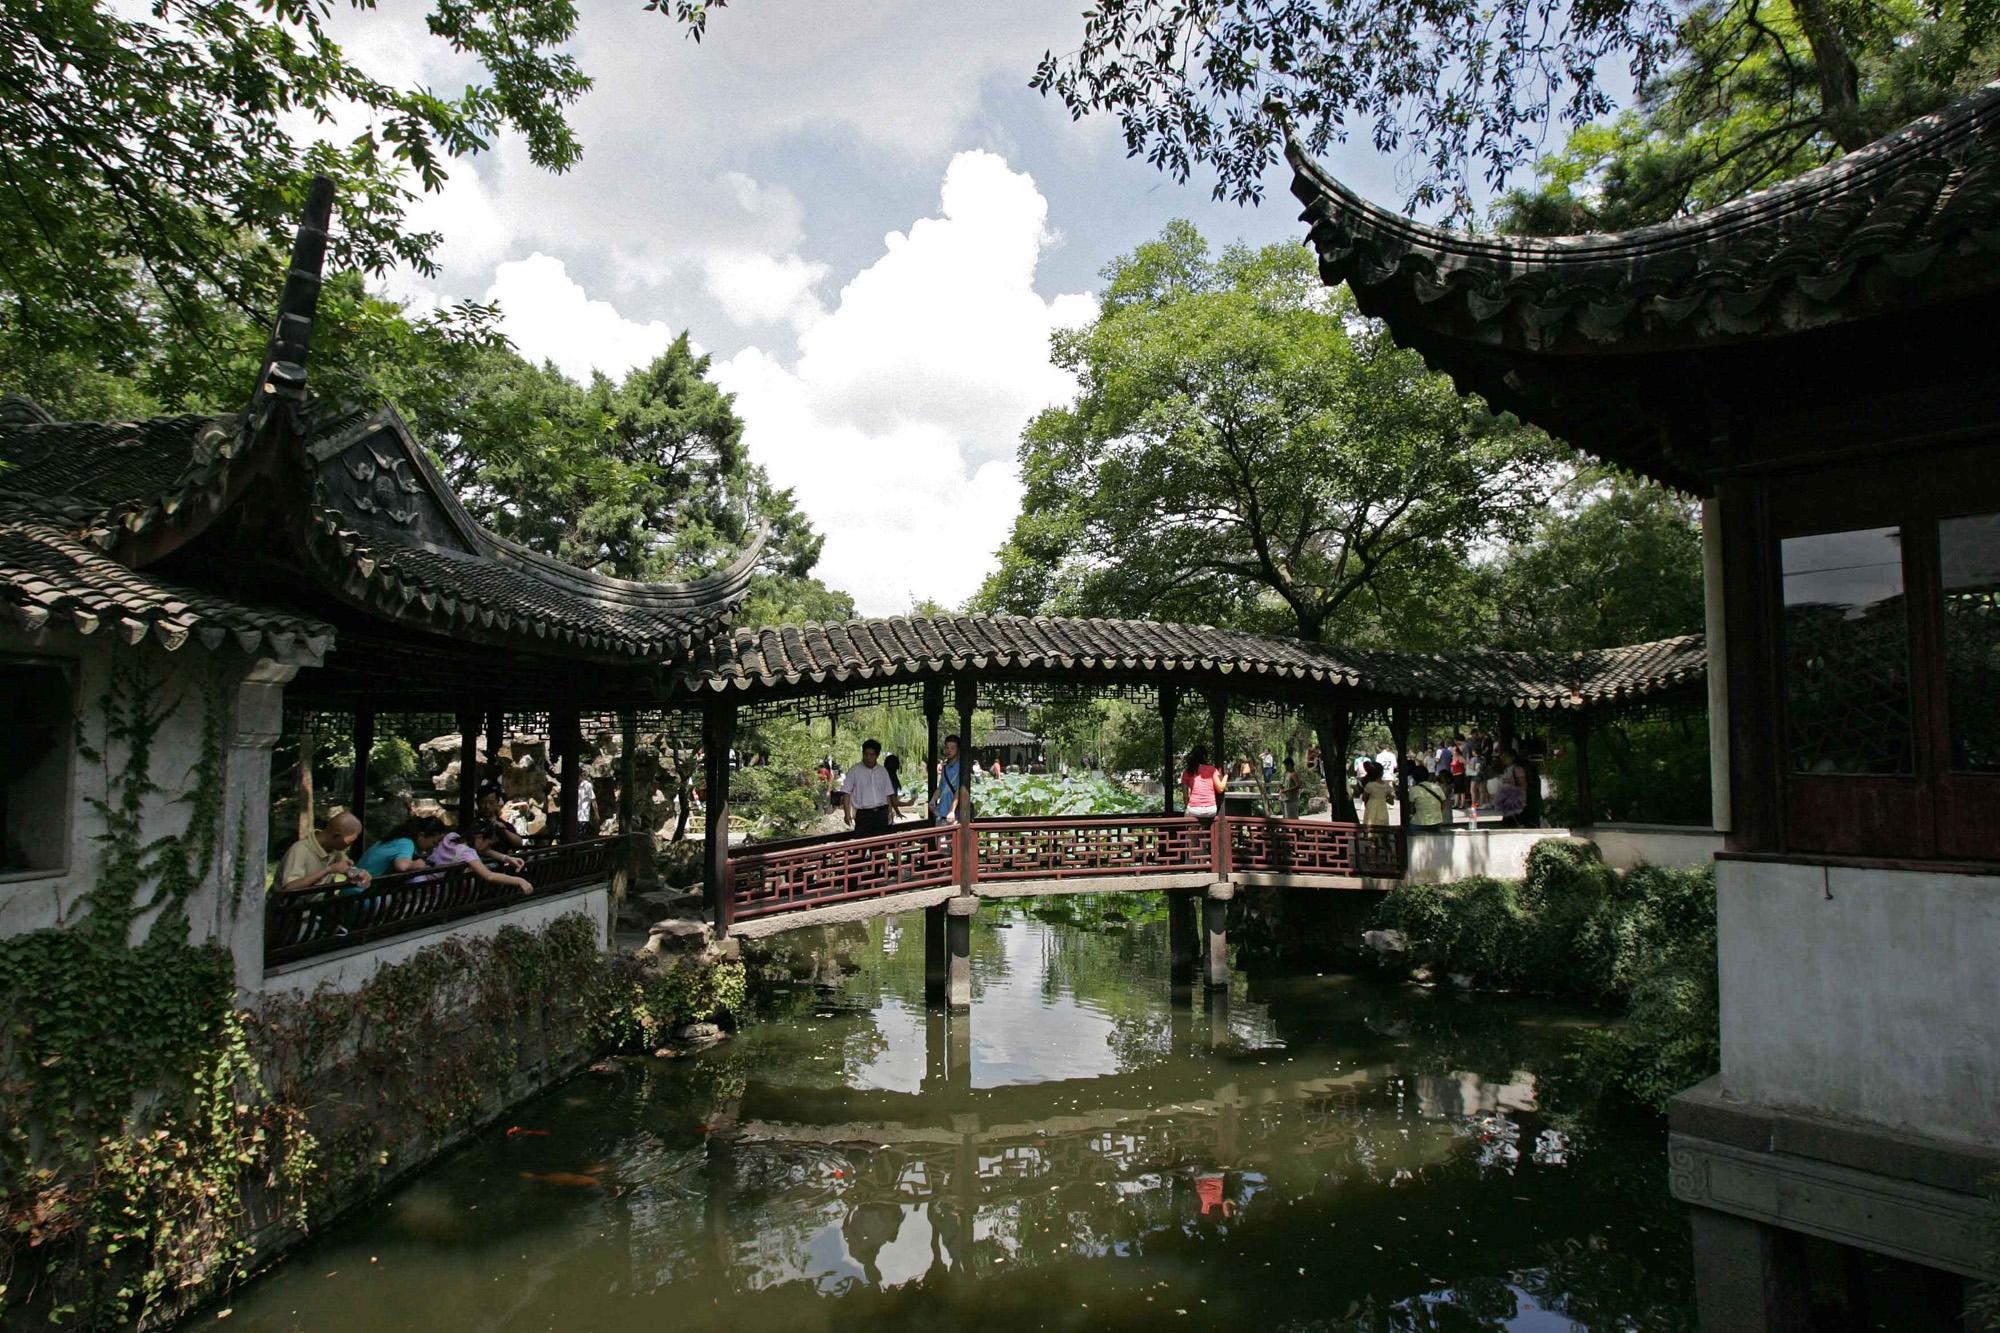 Xuzhou China  city images : Suzhou, China